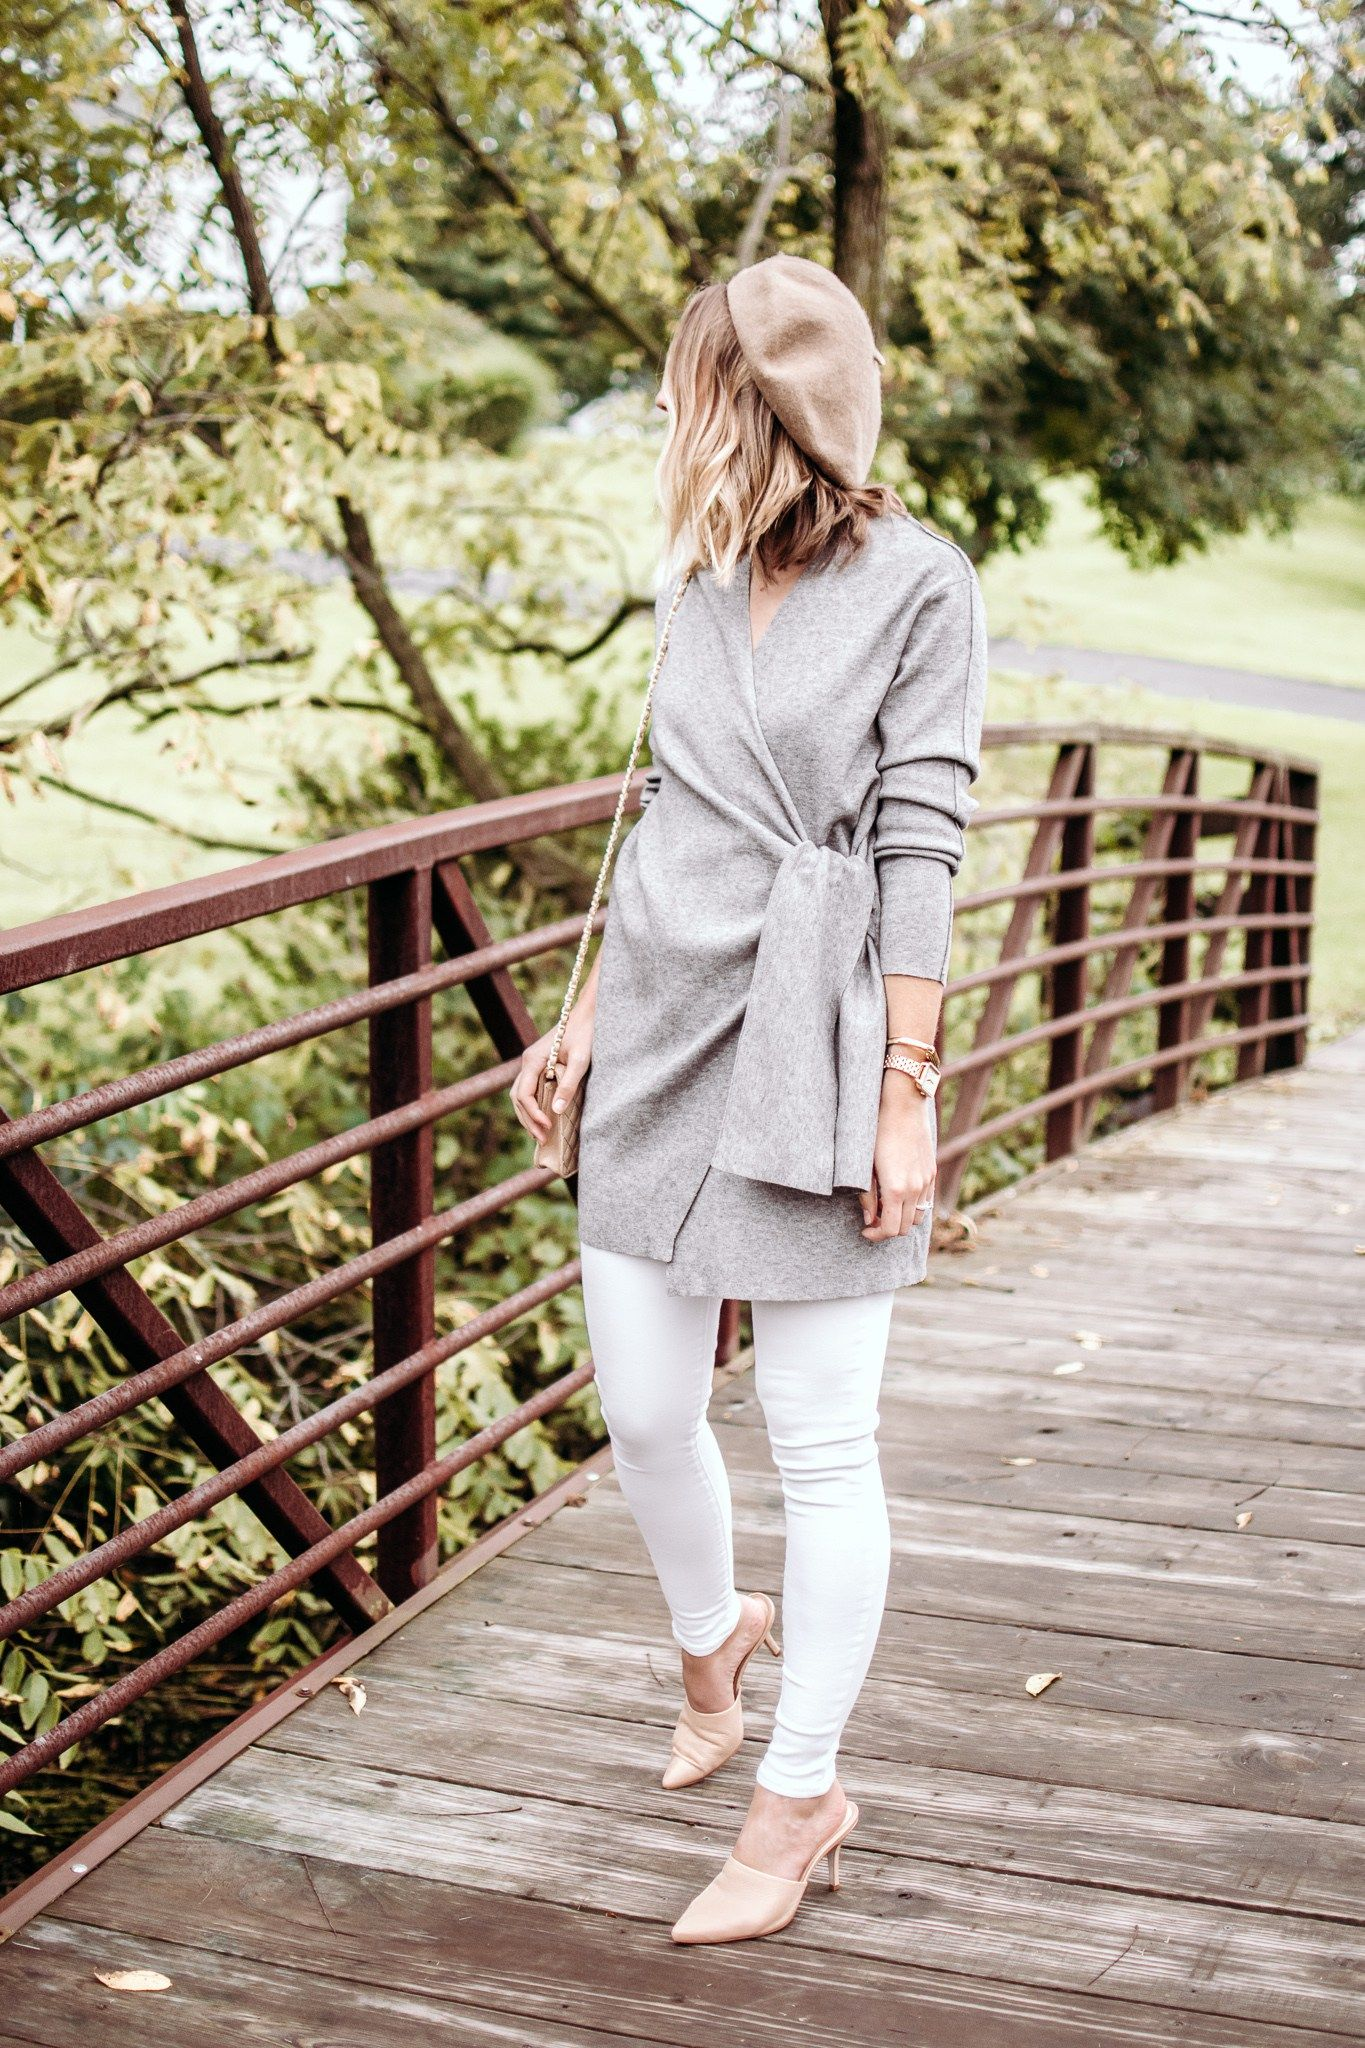 841e9b364ac Parisian style with a grey wrap cardigan and tan beret